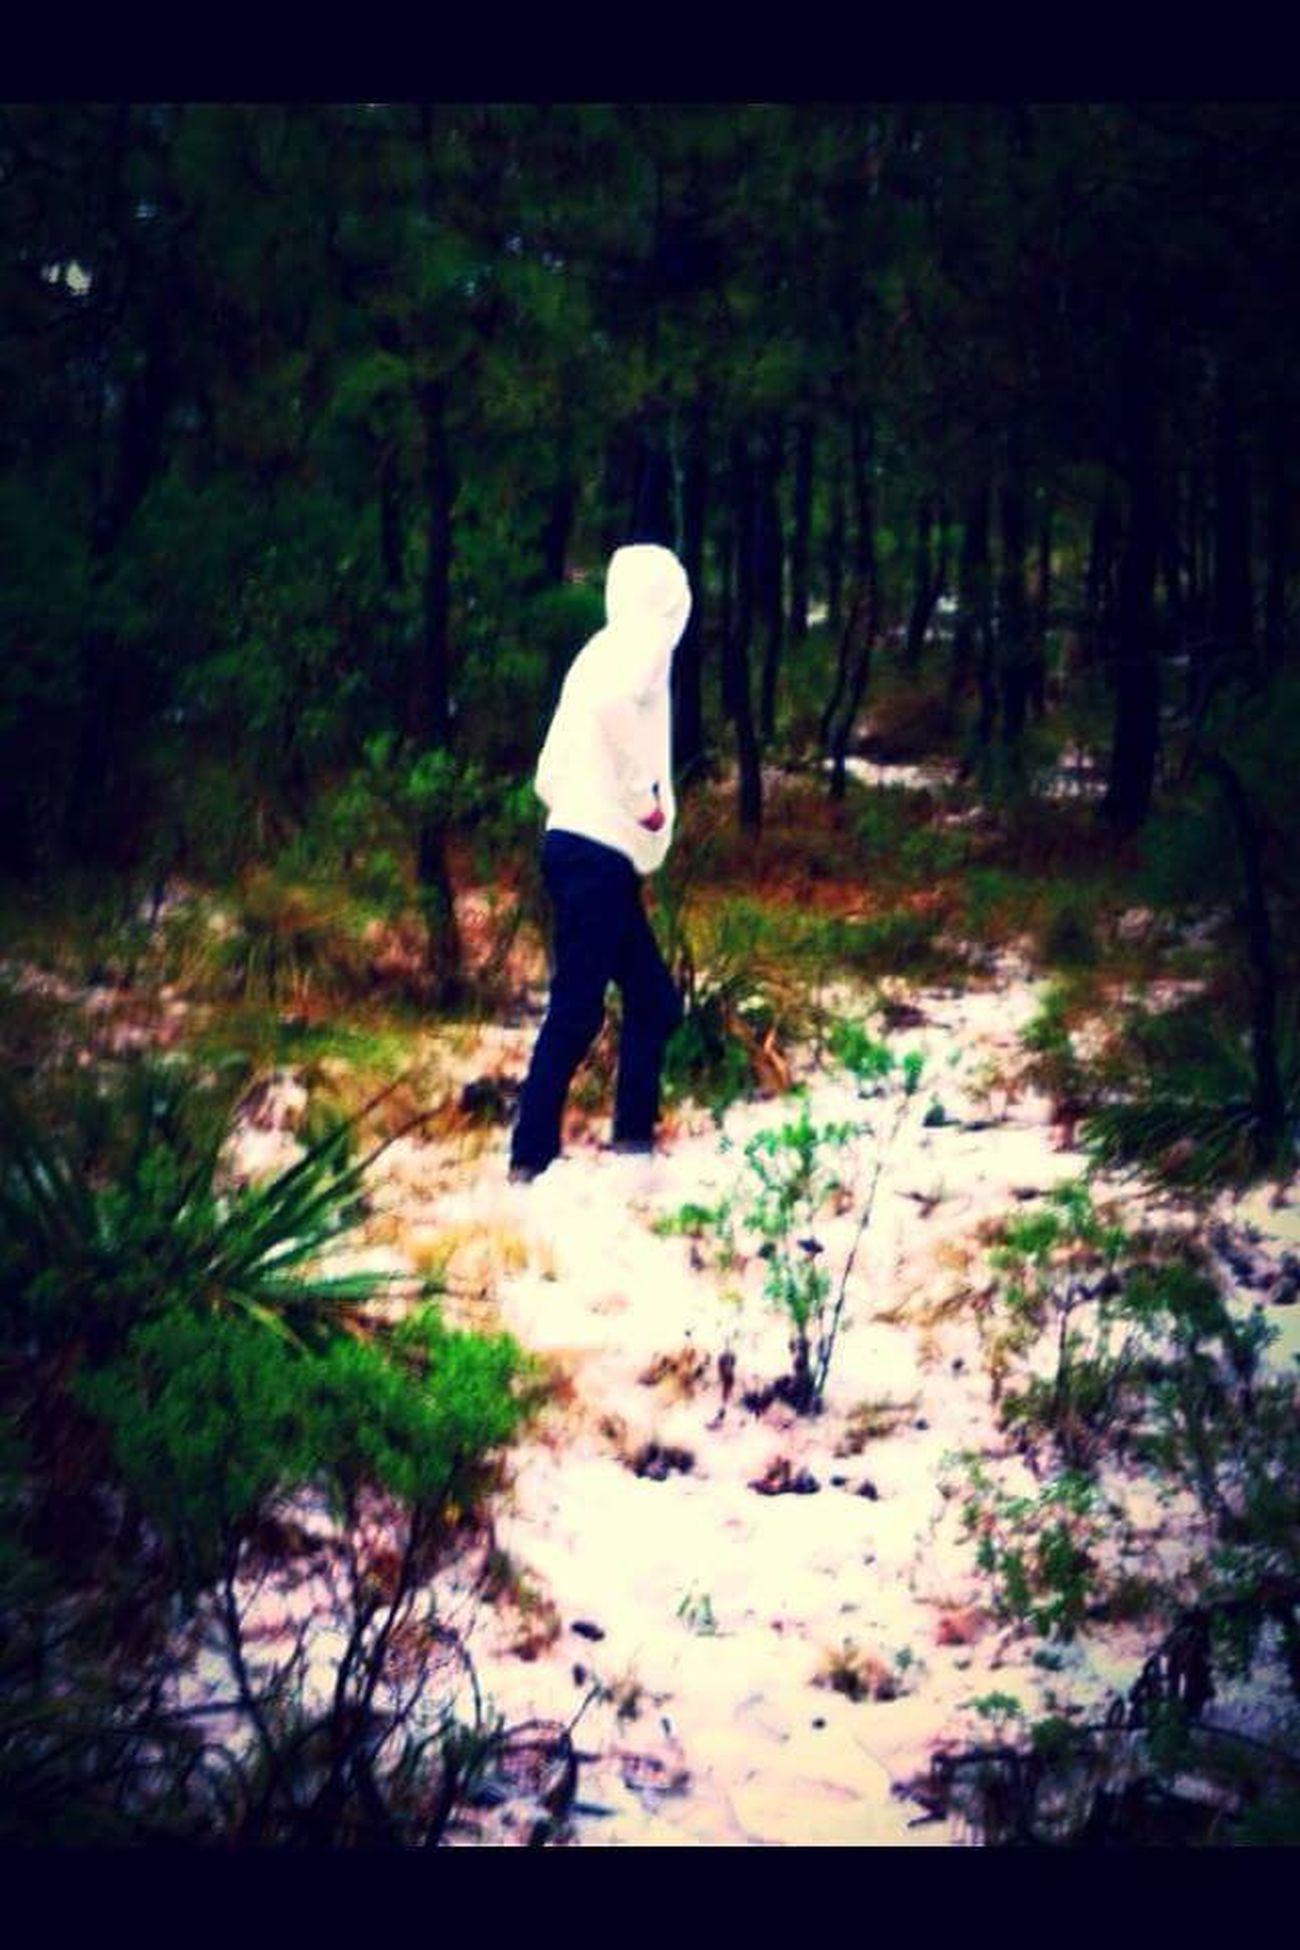 Adventure Nature Bosque Y Vida Bosque Negro Bosque Encantado Hello World Beauty In Nature Psicodelic TRYPTpic LSD Hofmann Alucination Tree Mountain Montains    Montañas❤ Lifestyles Mundo Nuevo Sexto Sentido Visionphotography